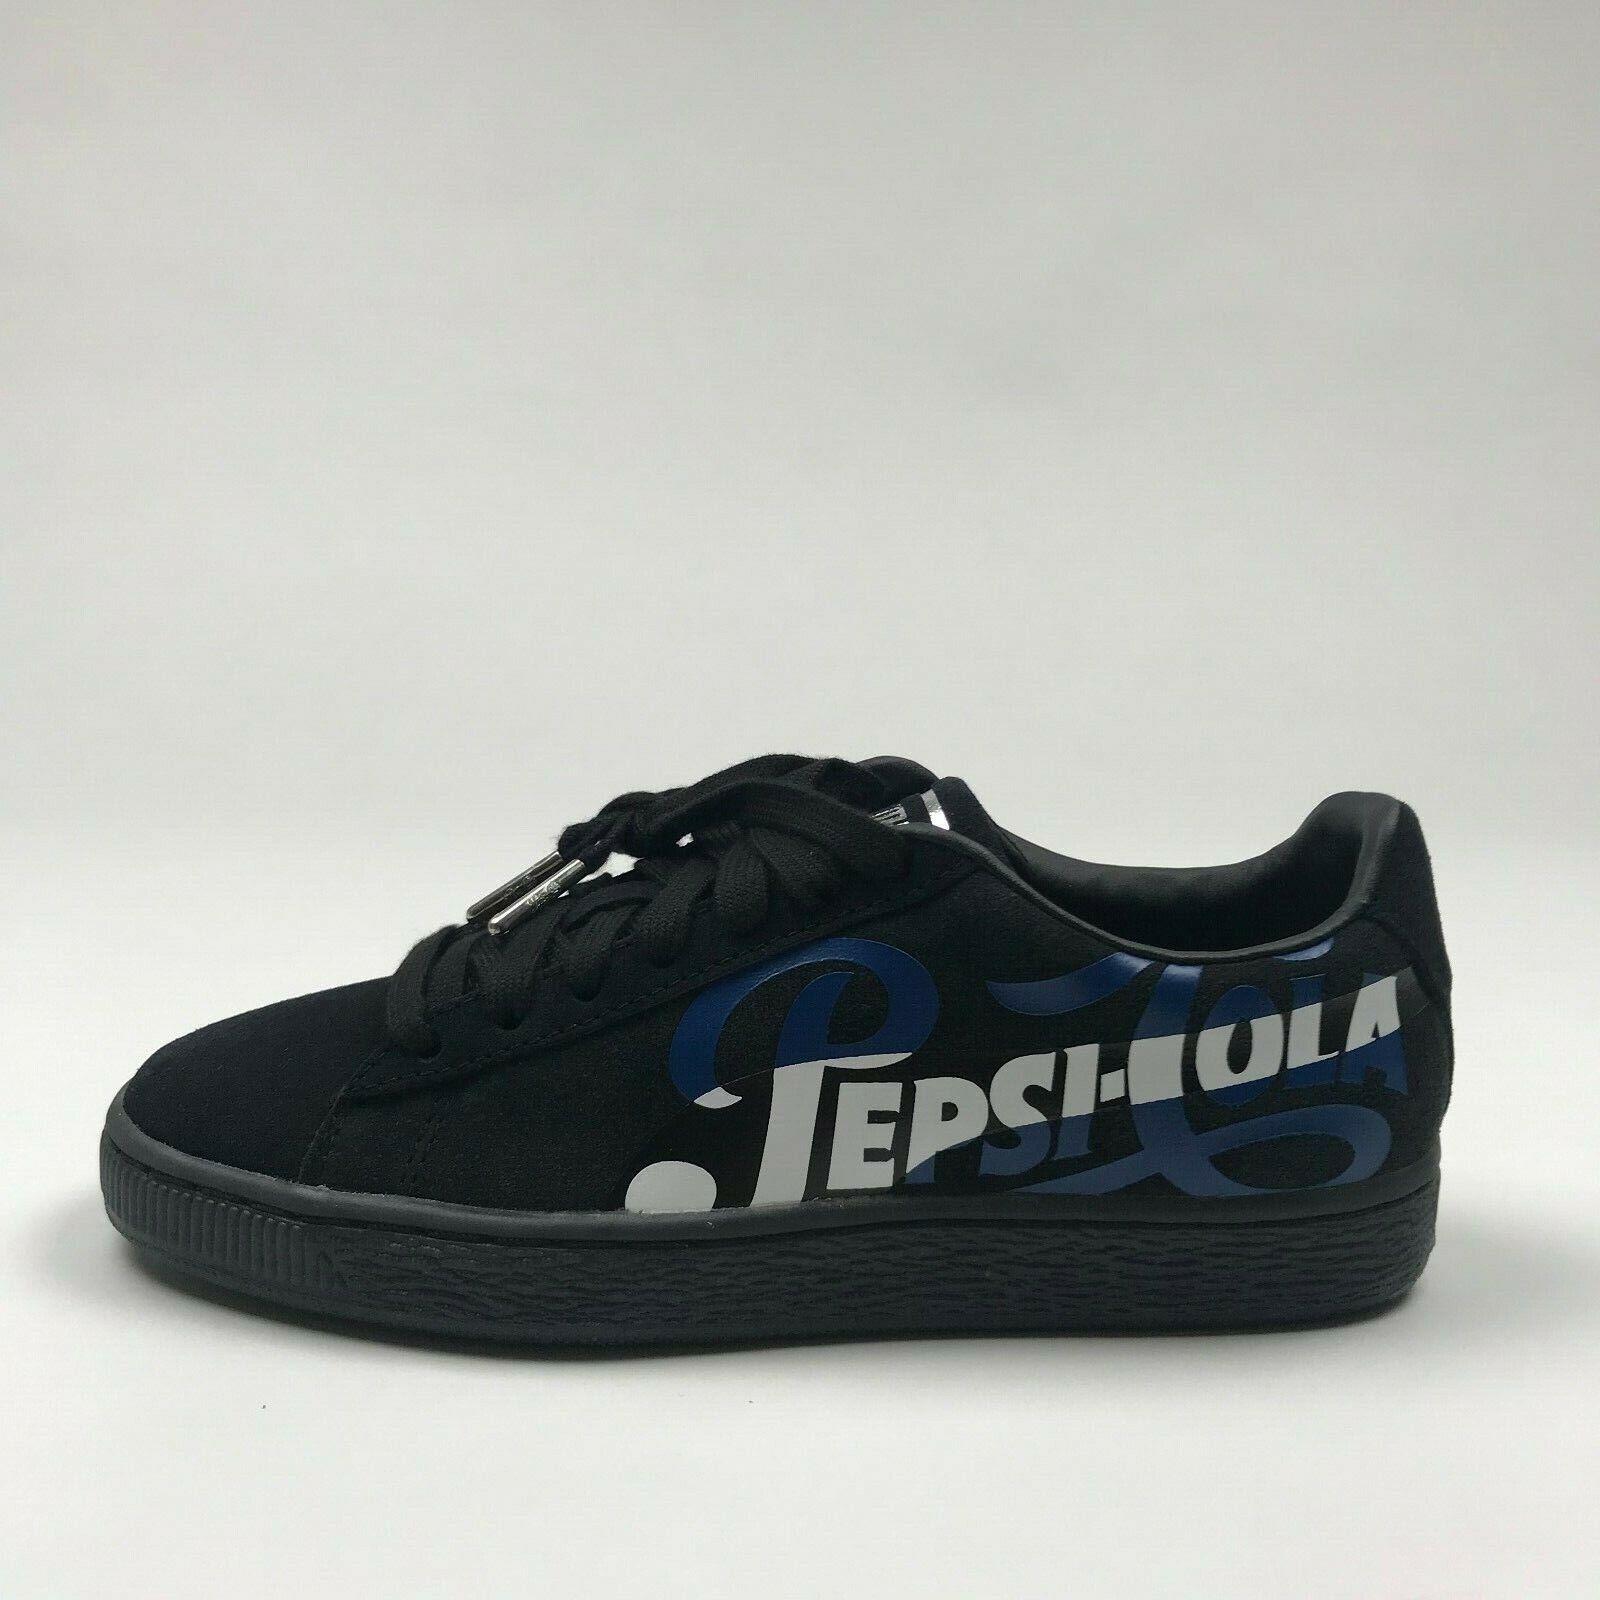 buy online 066a1 4b13b PEPSI x Puma Suede Classic BLACK BLACK BLACK 366332 02 MENS ...